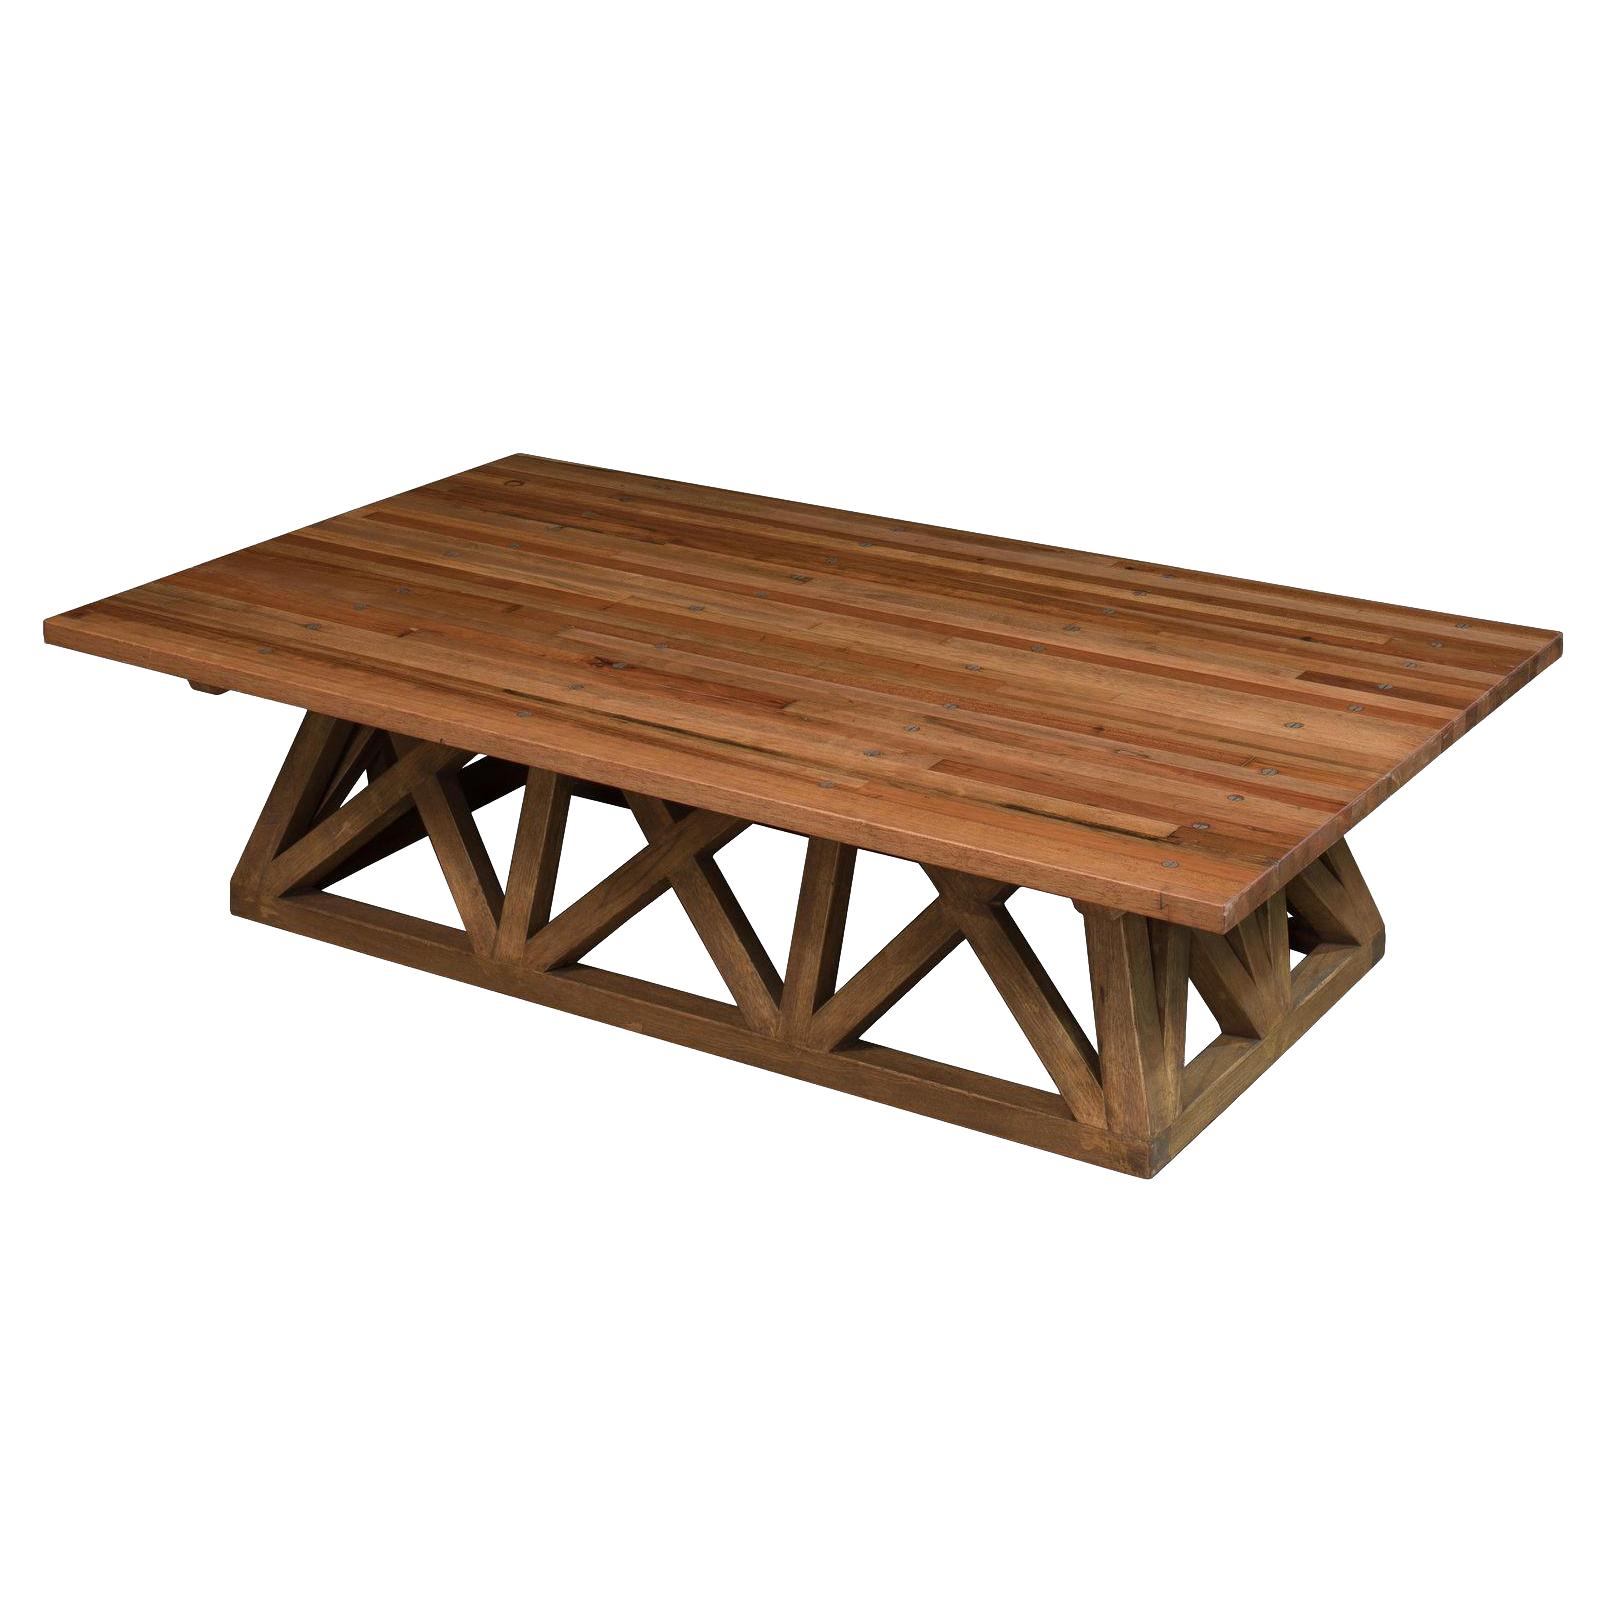 Vintage Sarreid Ltd Truck Bed Coffee Table Chairish